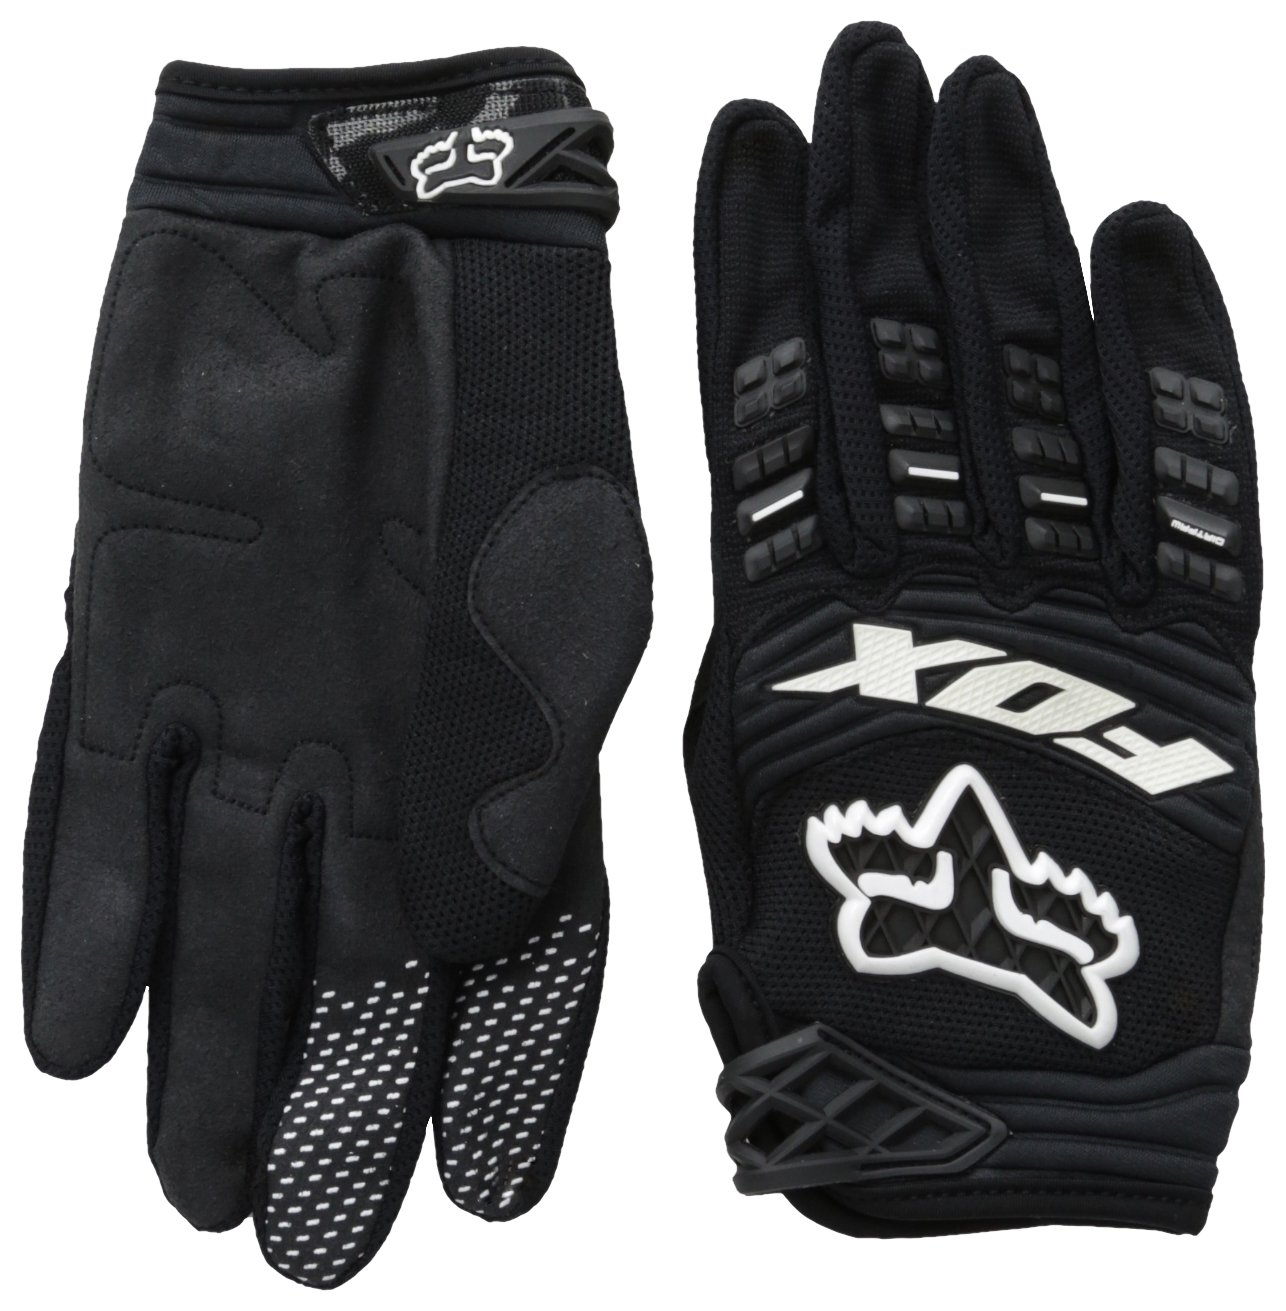 2014 Fox Head Men's Dirtpaw Race Glove Black, Large by Fox Racing